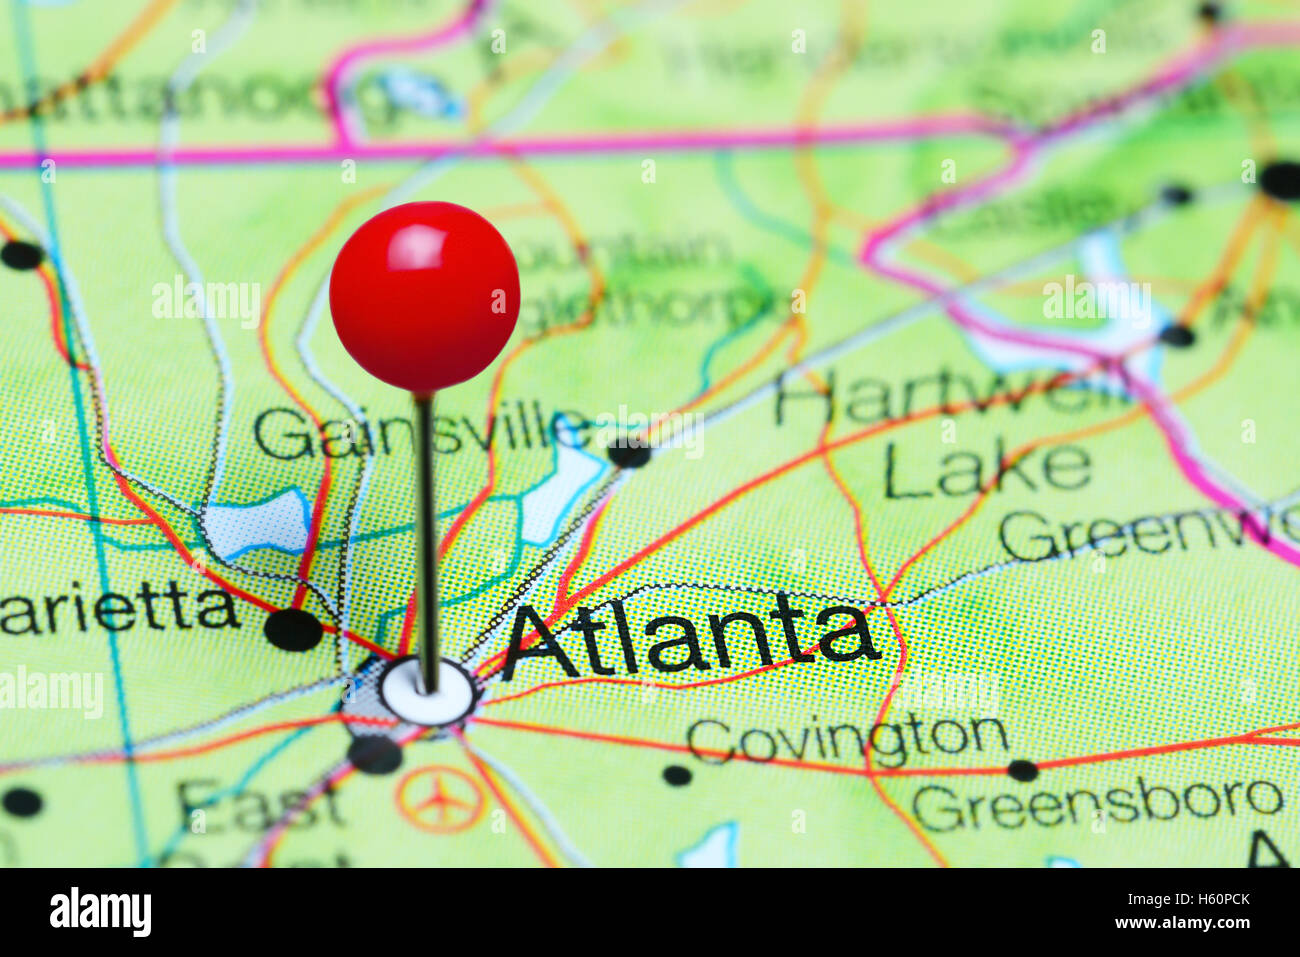 Map Of Georgia In Usa.Atlanta Pinned On A Map Of Georgia Usa Stock Photo 124178115 Alamy